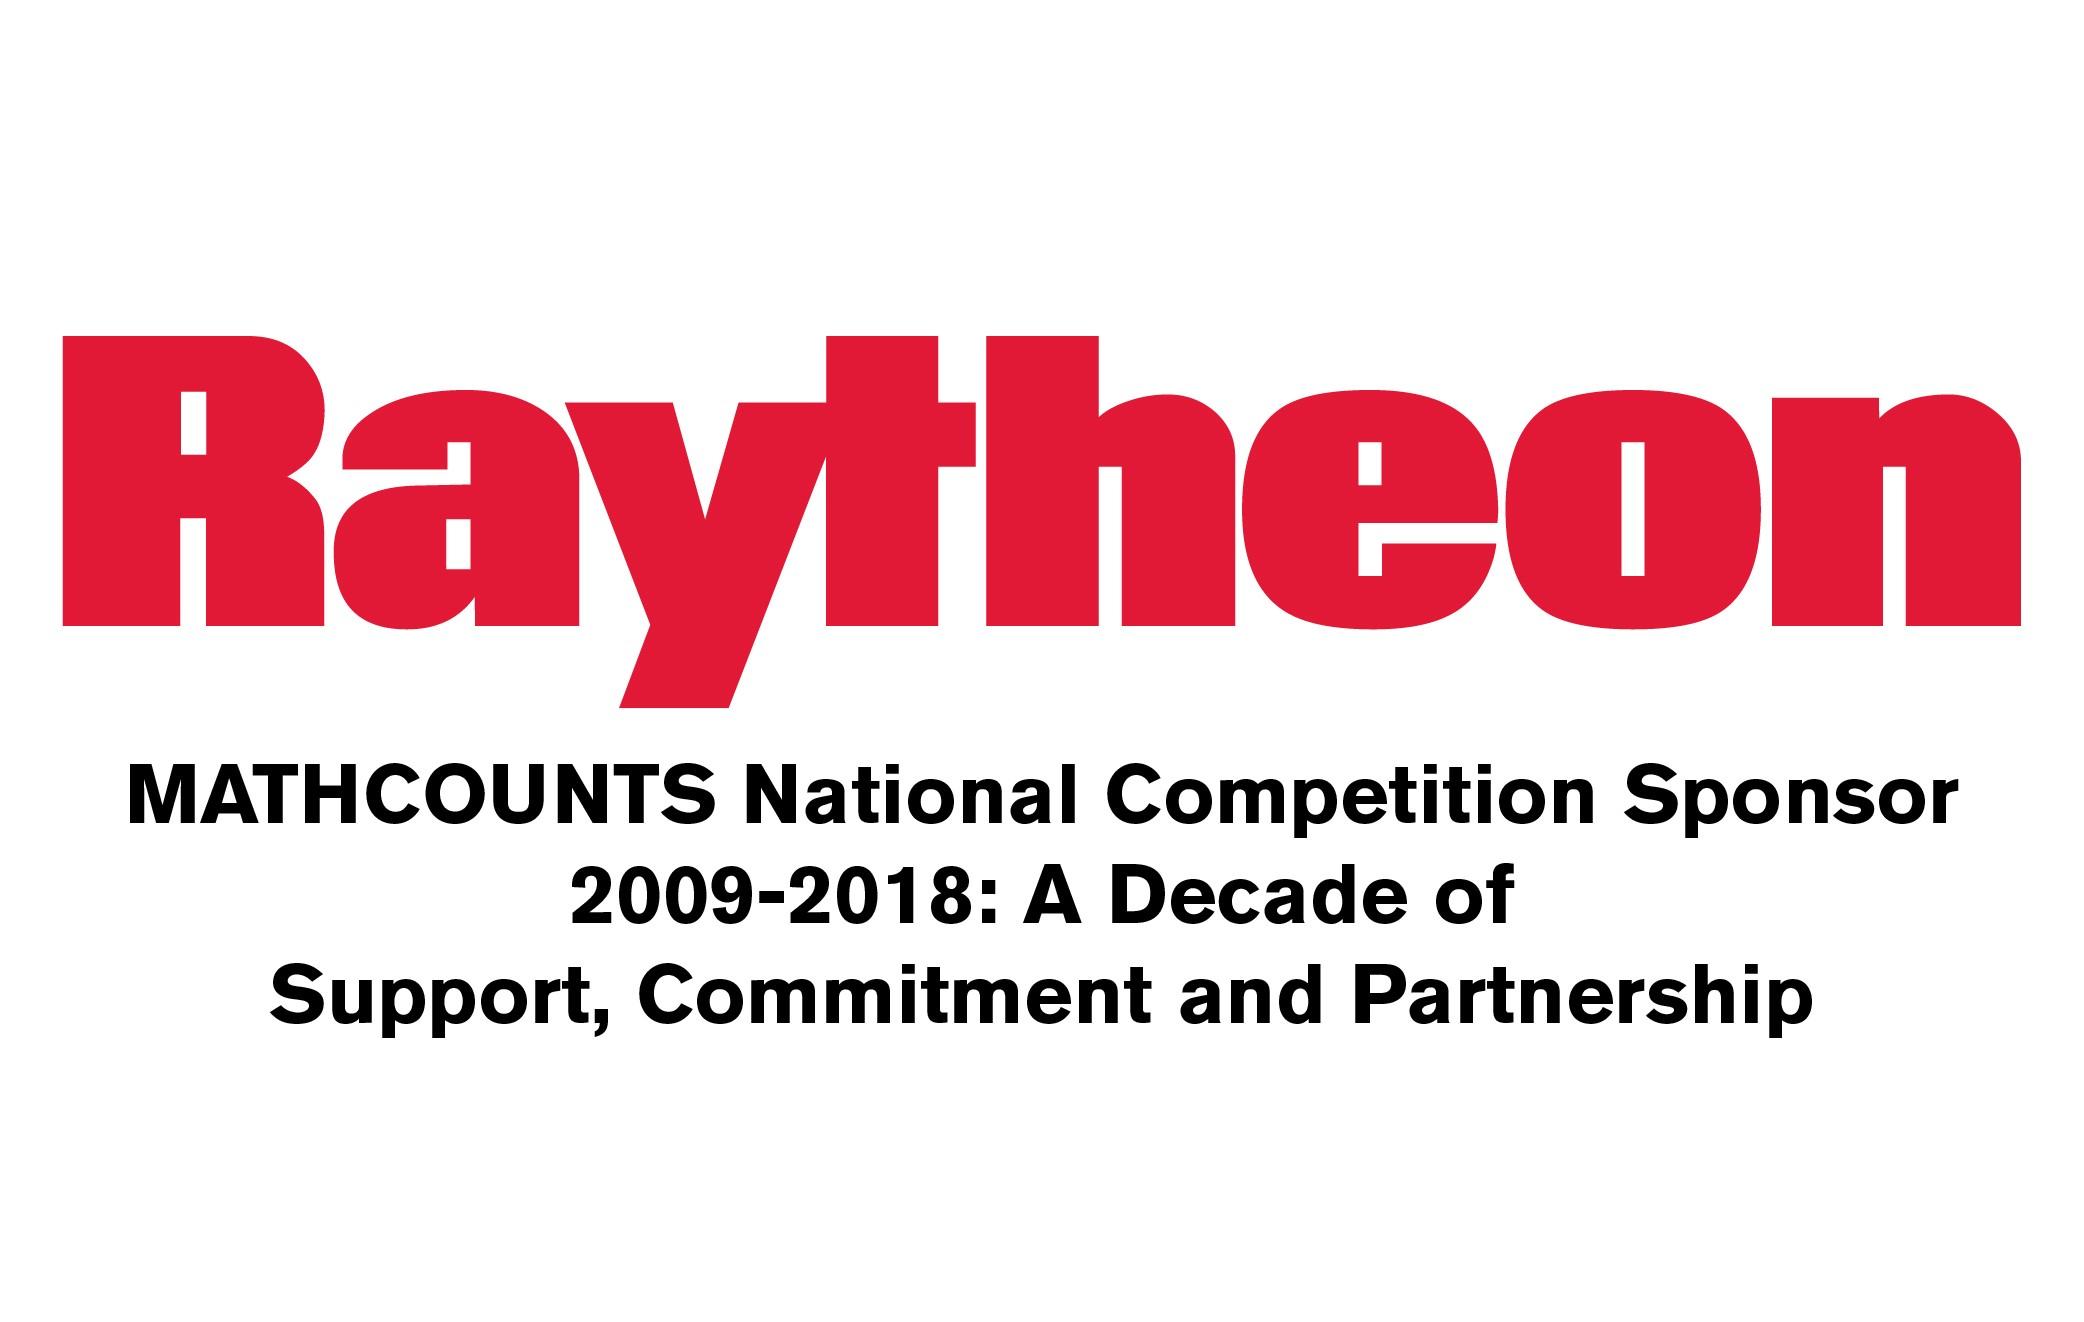 National Competition Mathcounts